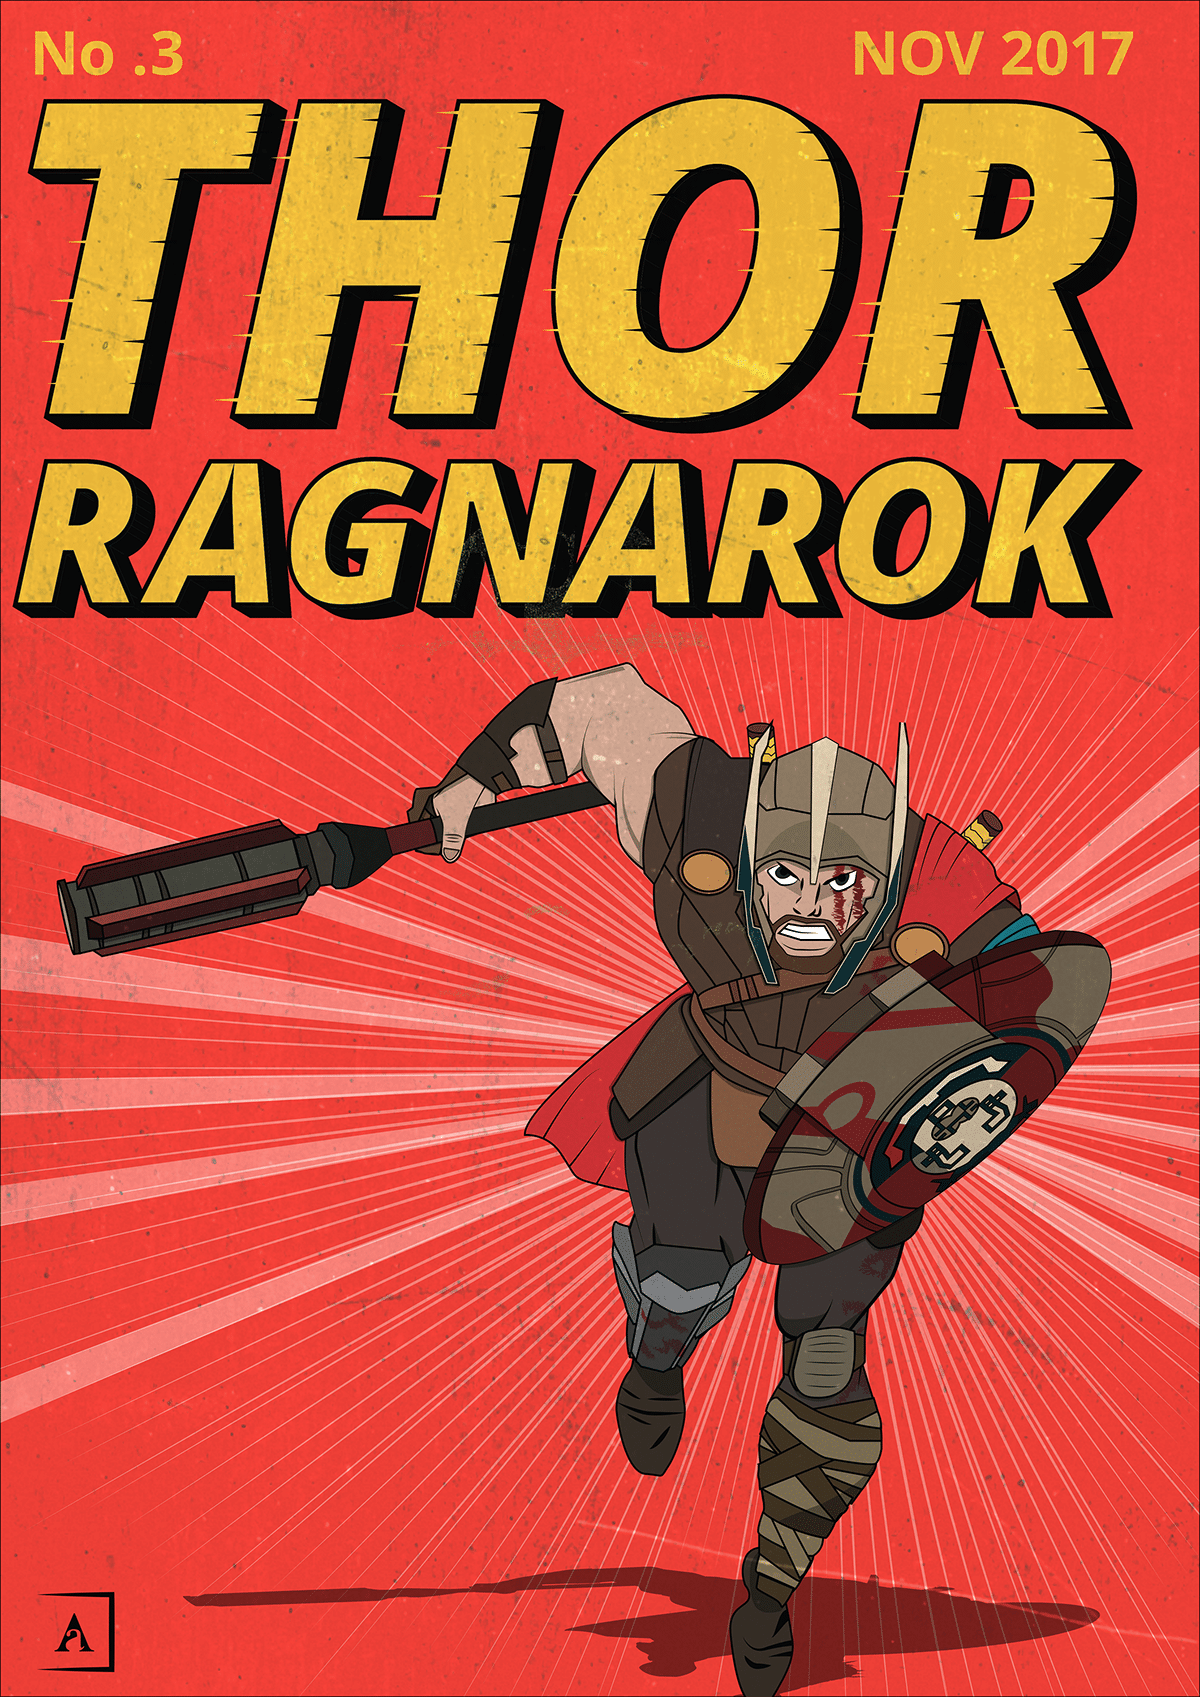 Thor-Ragnarok-HD-printable-posters-thor-animated-cartoon-art-poster